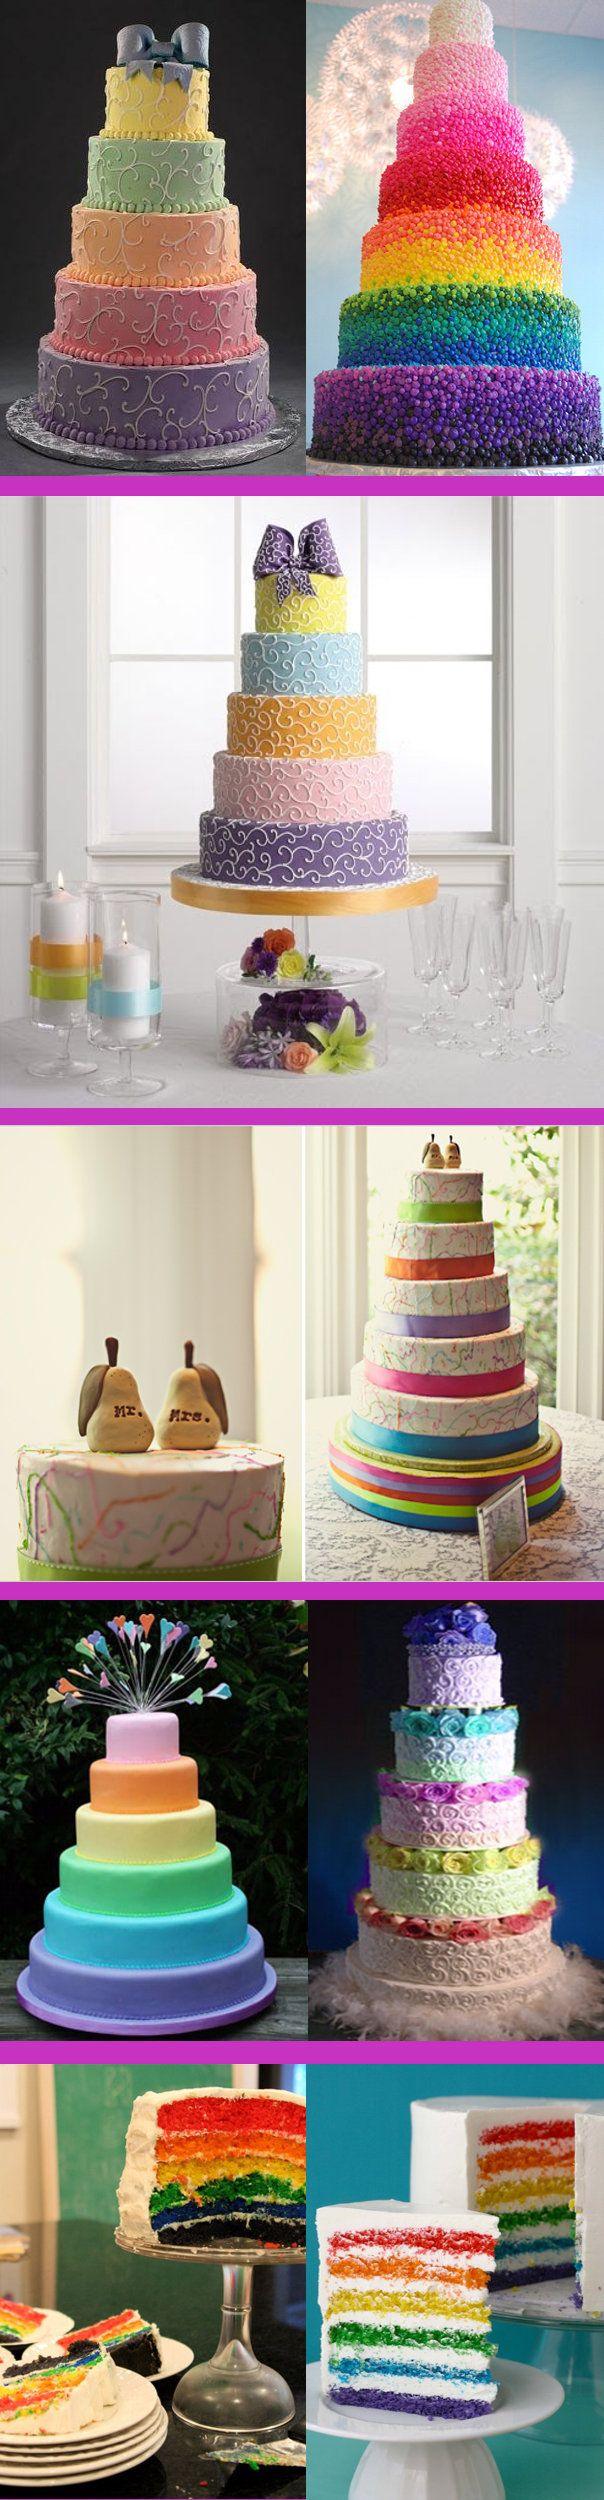 Best 25 Rainbow wedding cakes ideas only on Pinterest